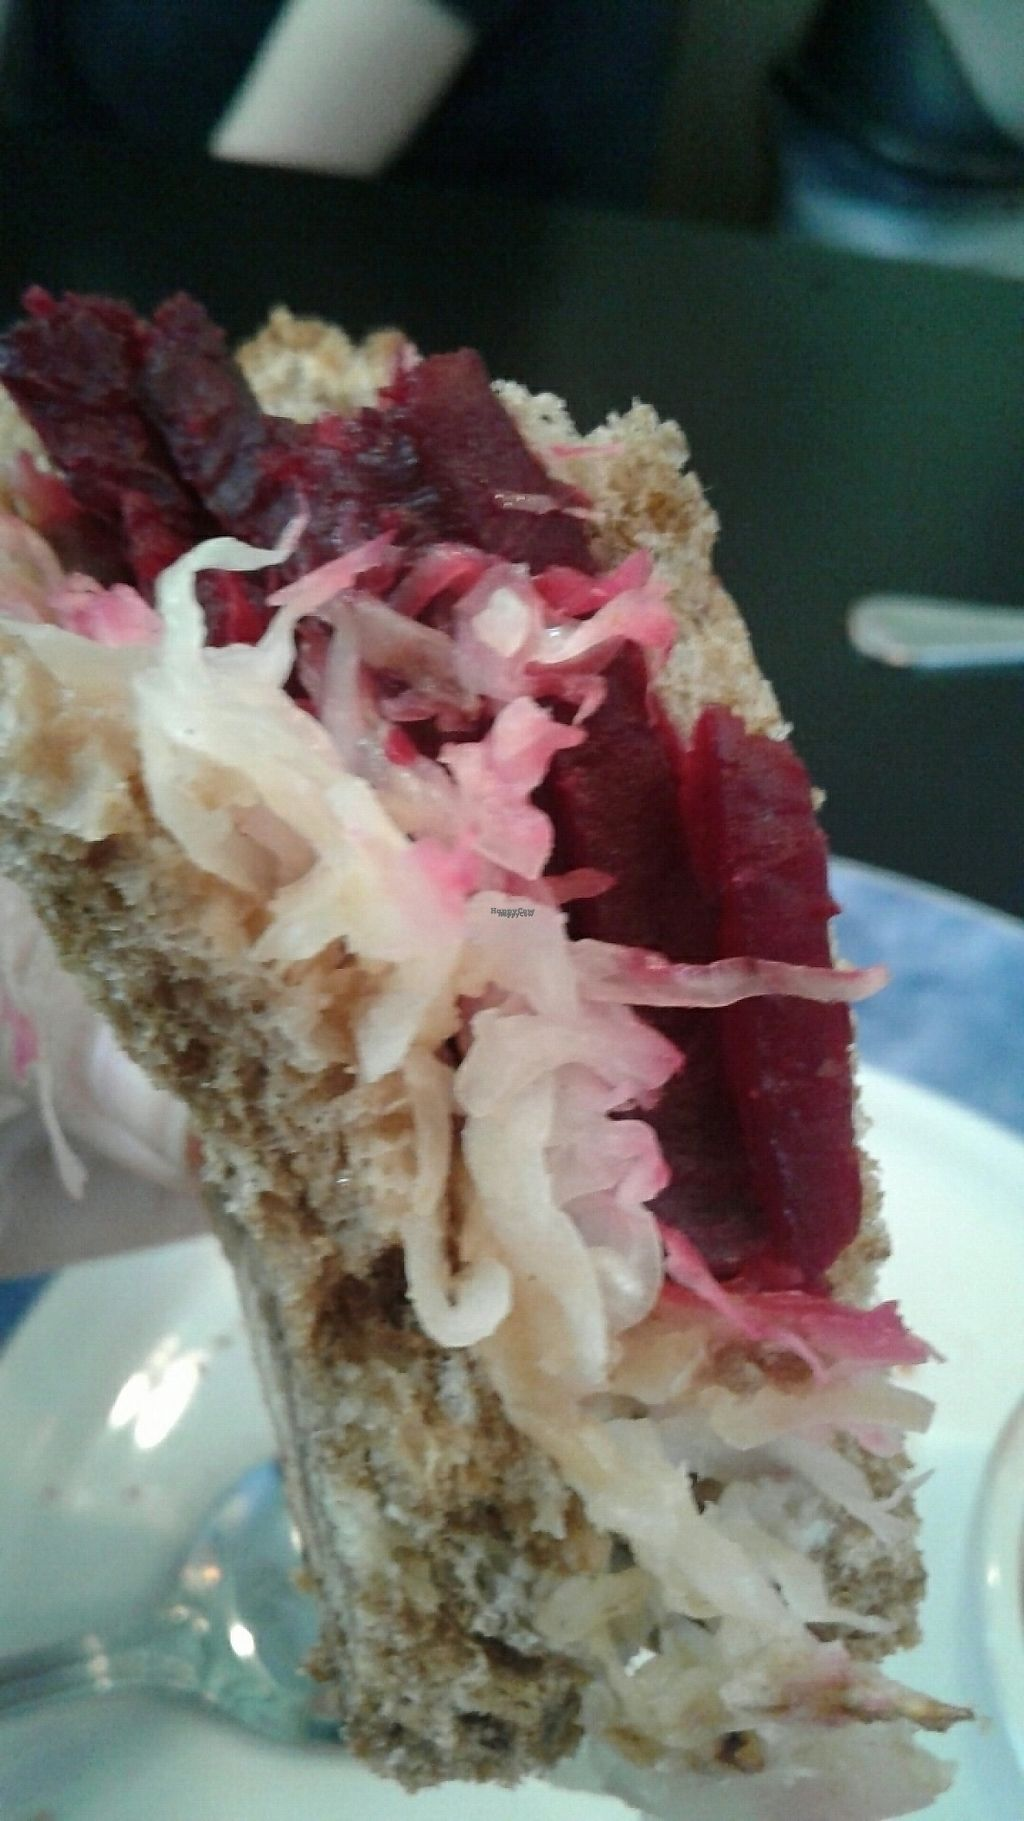 "Photo of Cafe Evergreen  by <a href=""/members/profile/FlowerGoddess420"">FlowerGoddess420</a> <br/>Vegan Beet Rueben Sandwich <br/> January 7, 2017  - <a href='/contact/abuse/image/45031/209149'>Report</a>"